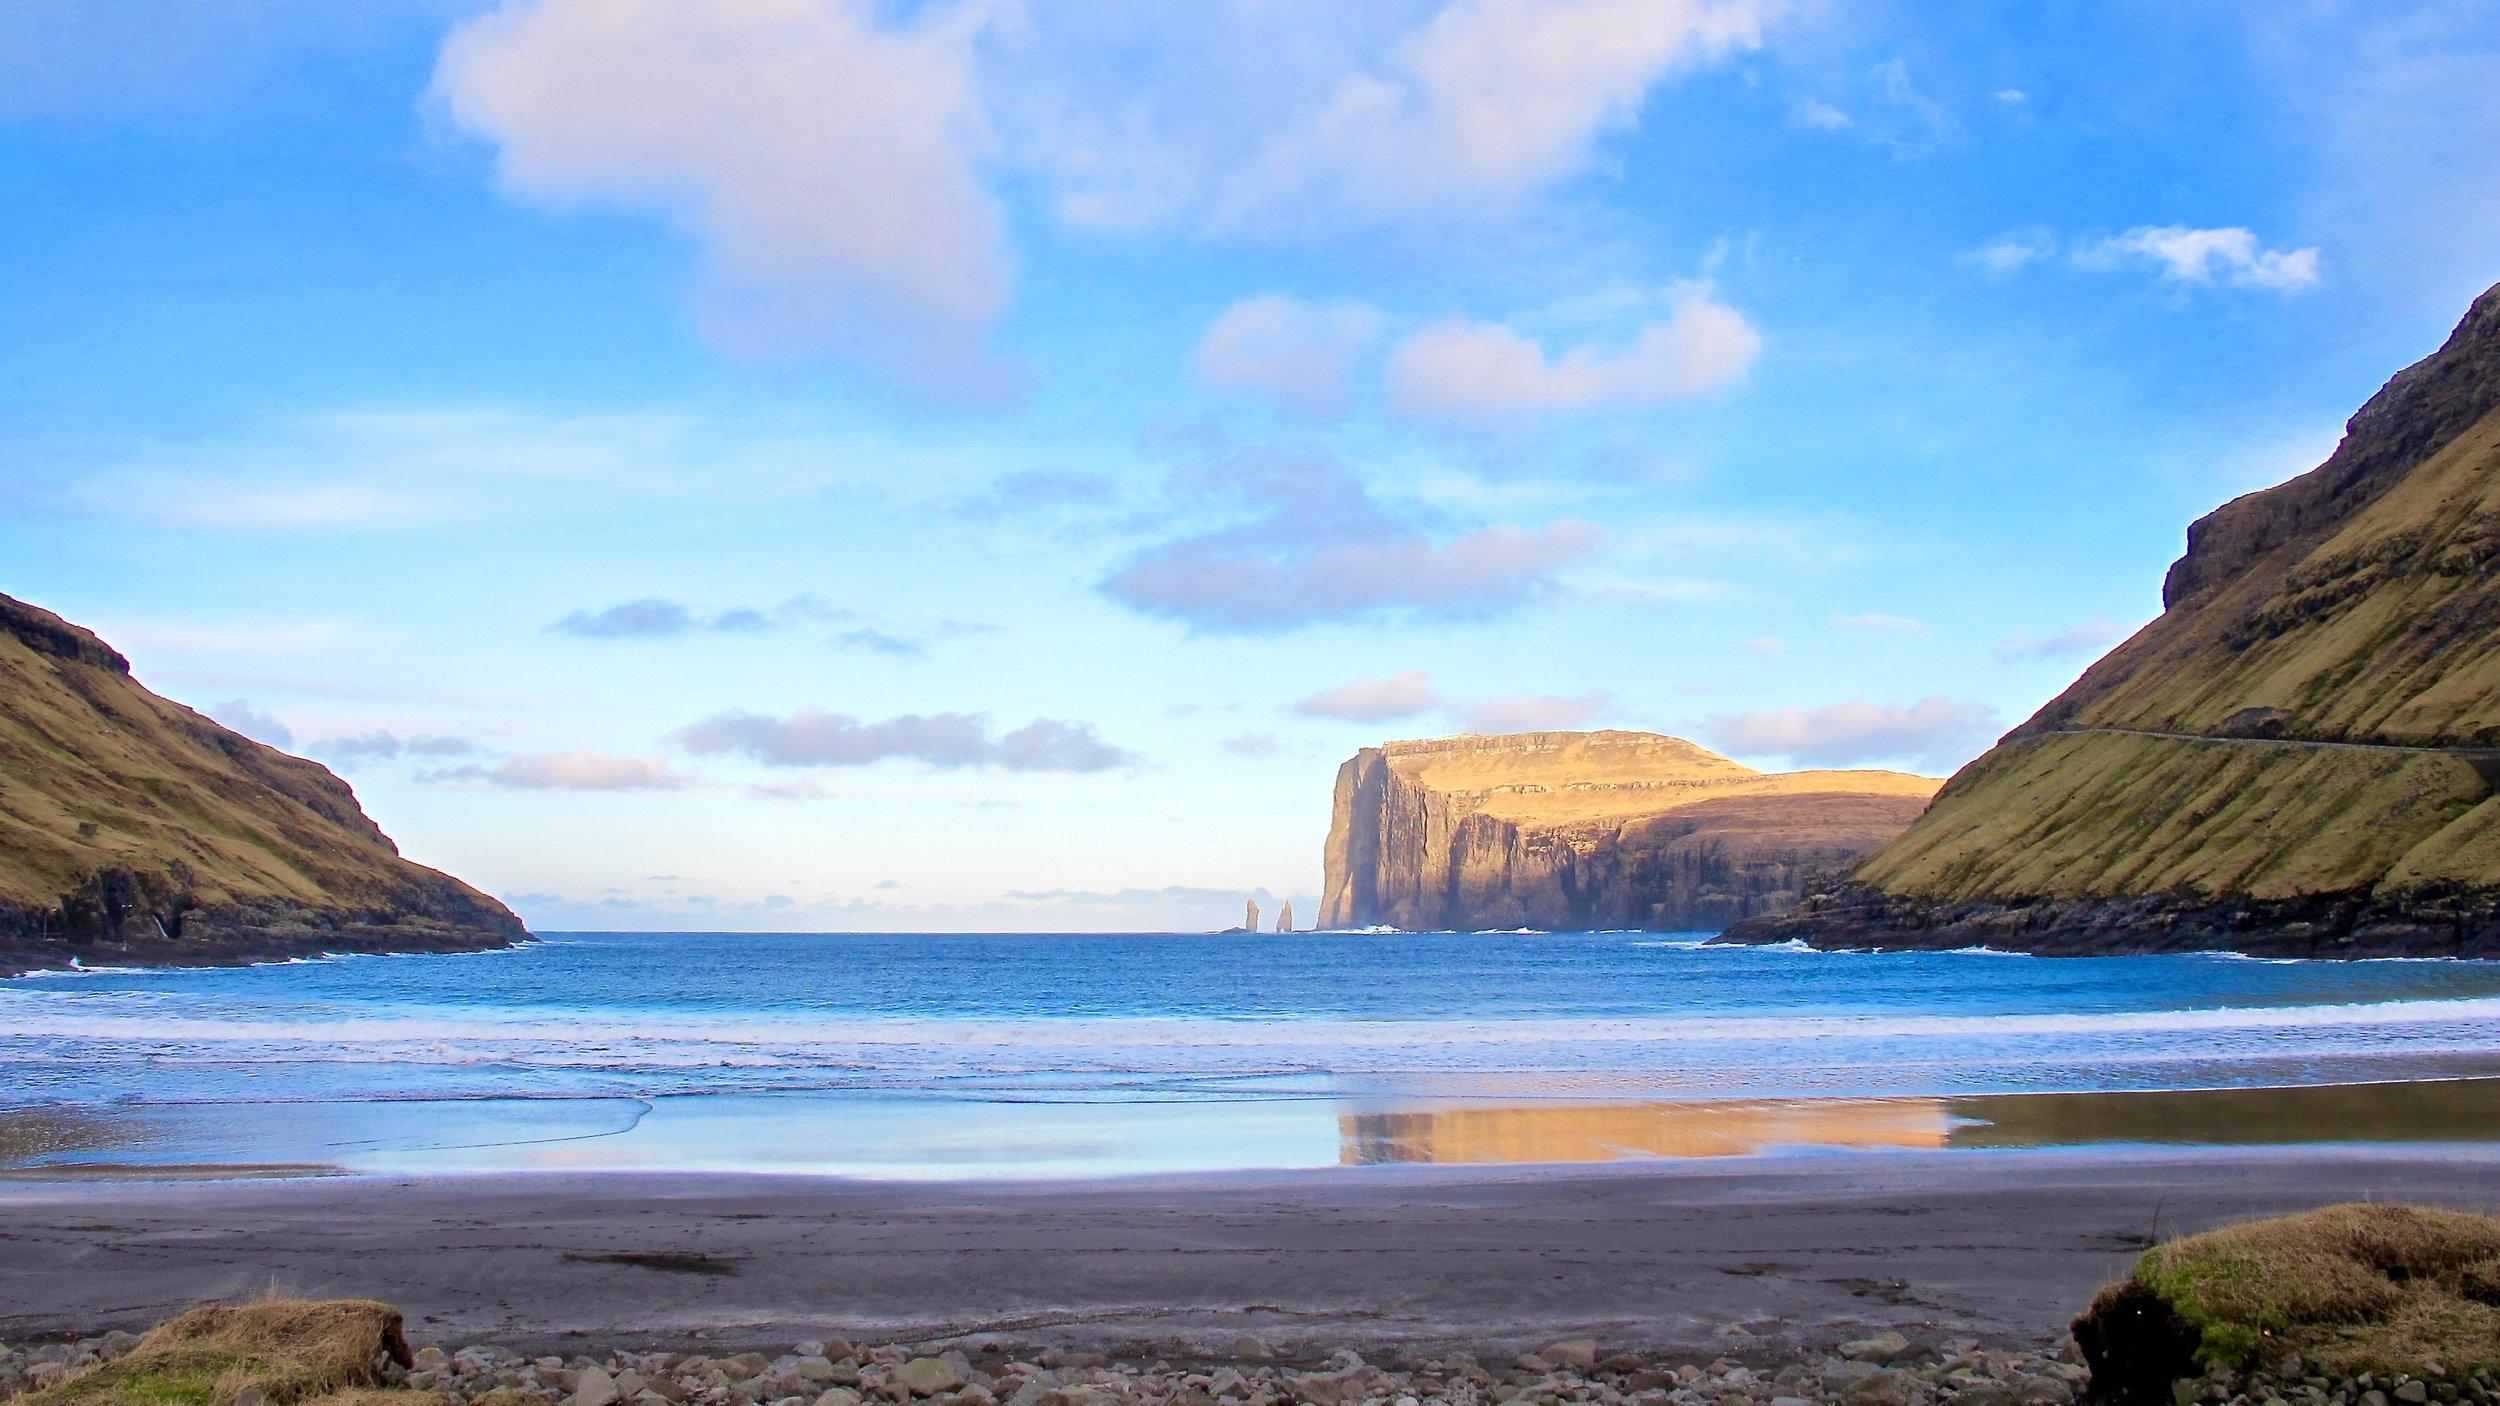 Tjørnuvík Beach View, Streymoy, with the two petrified secret agents on the horizon